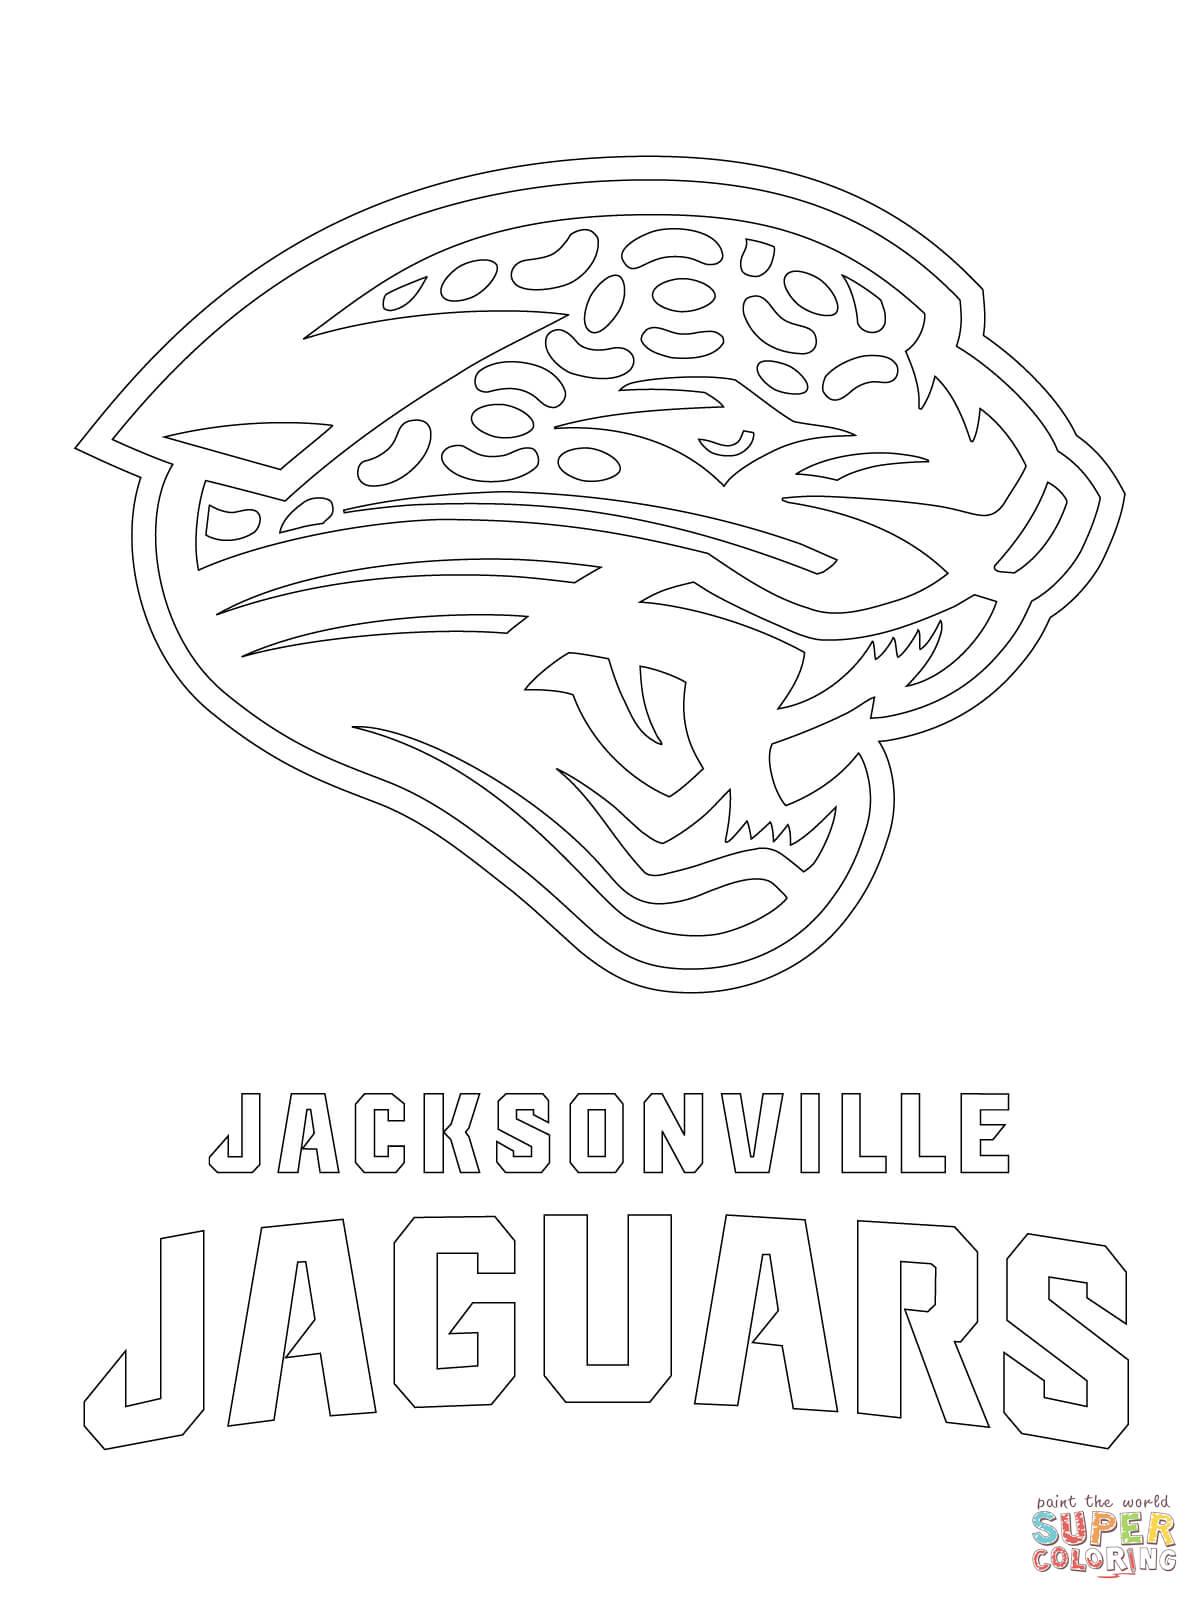 Jacksonville Jaguars Logo Coloring Page Free Printable Coloring